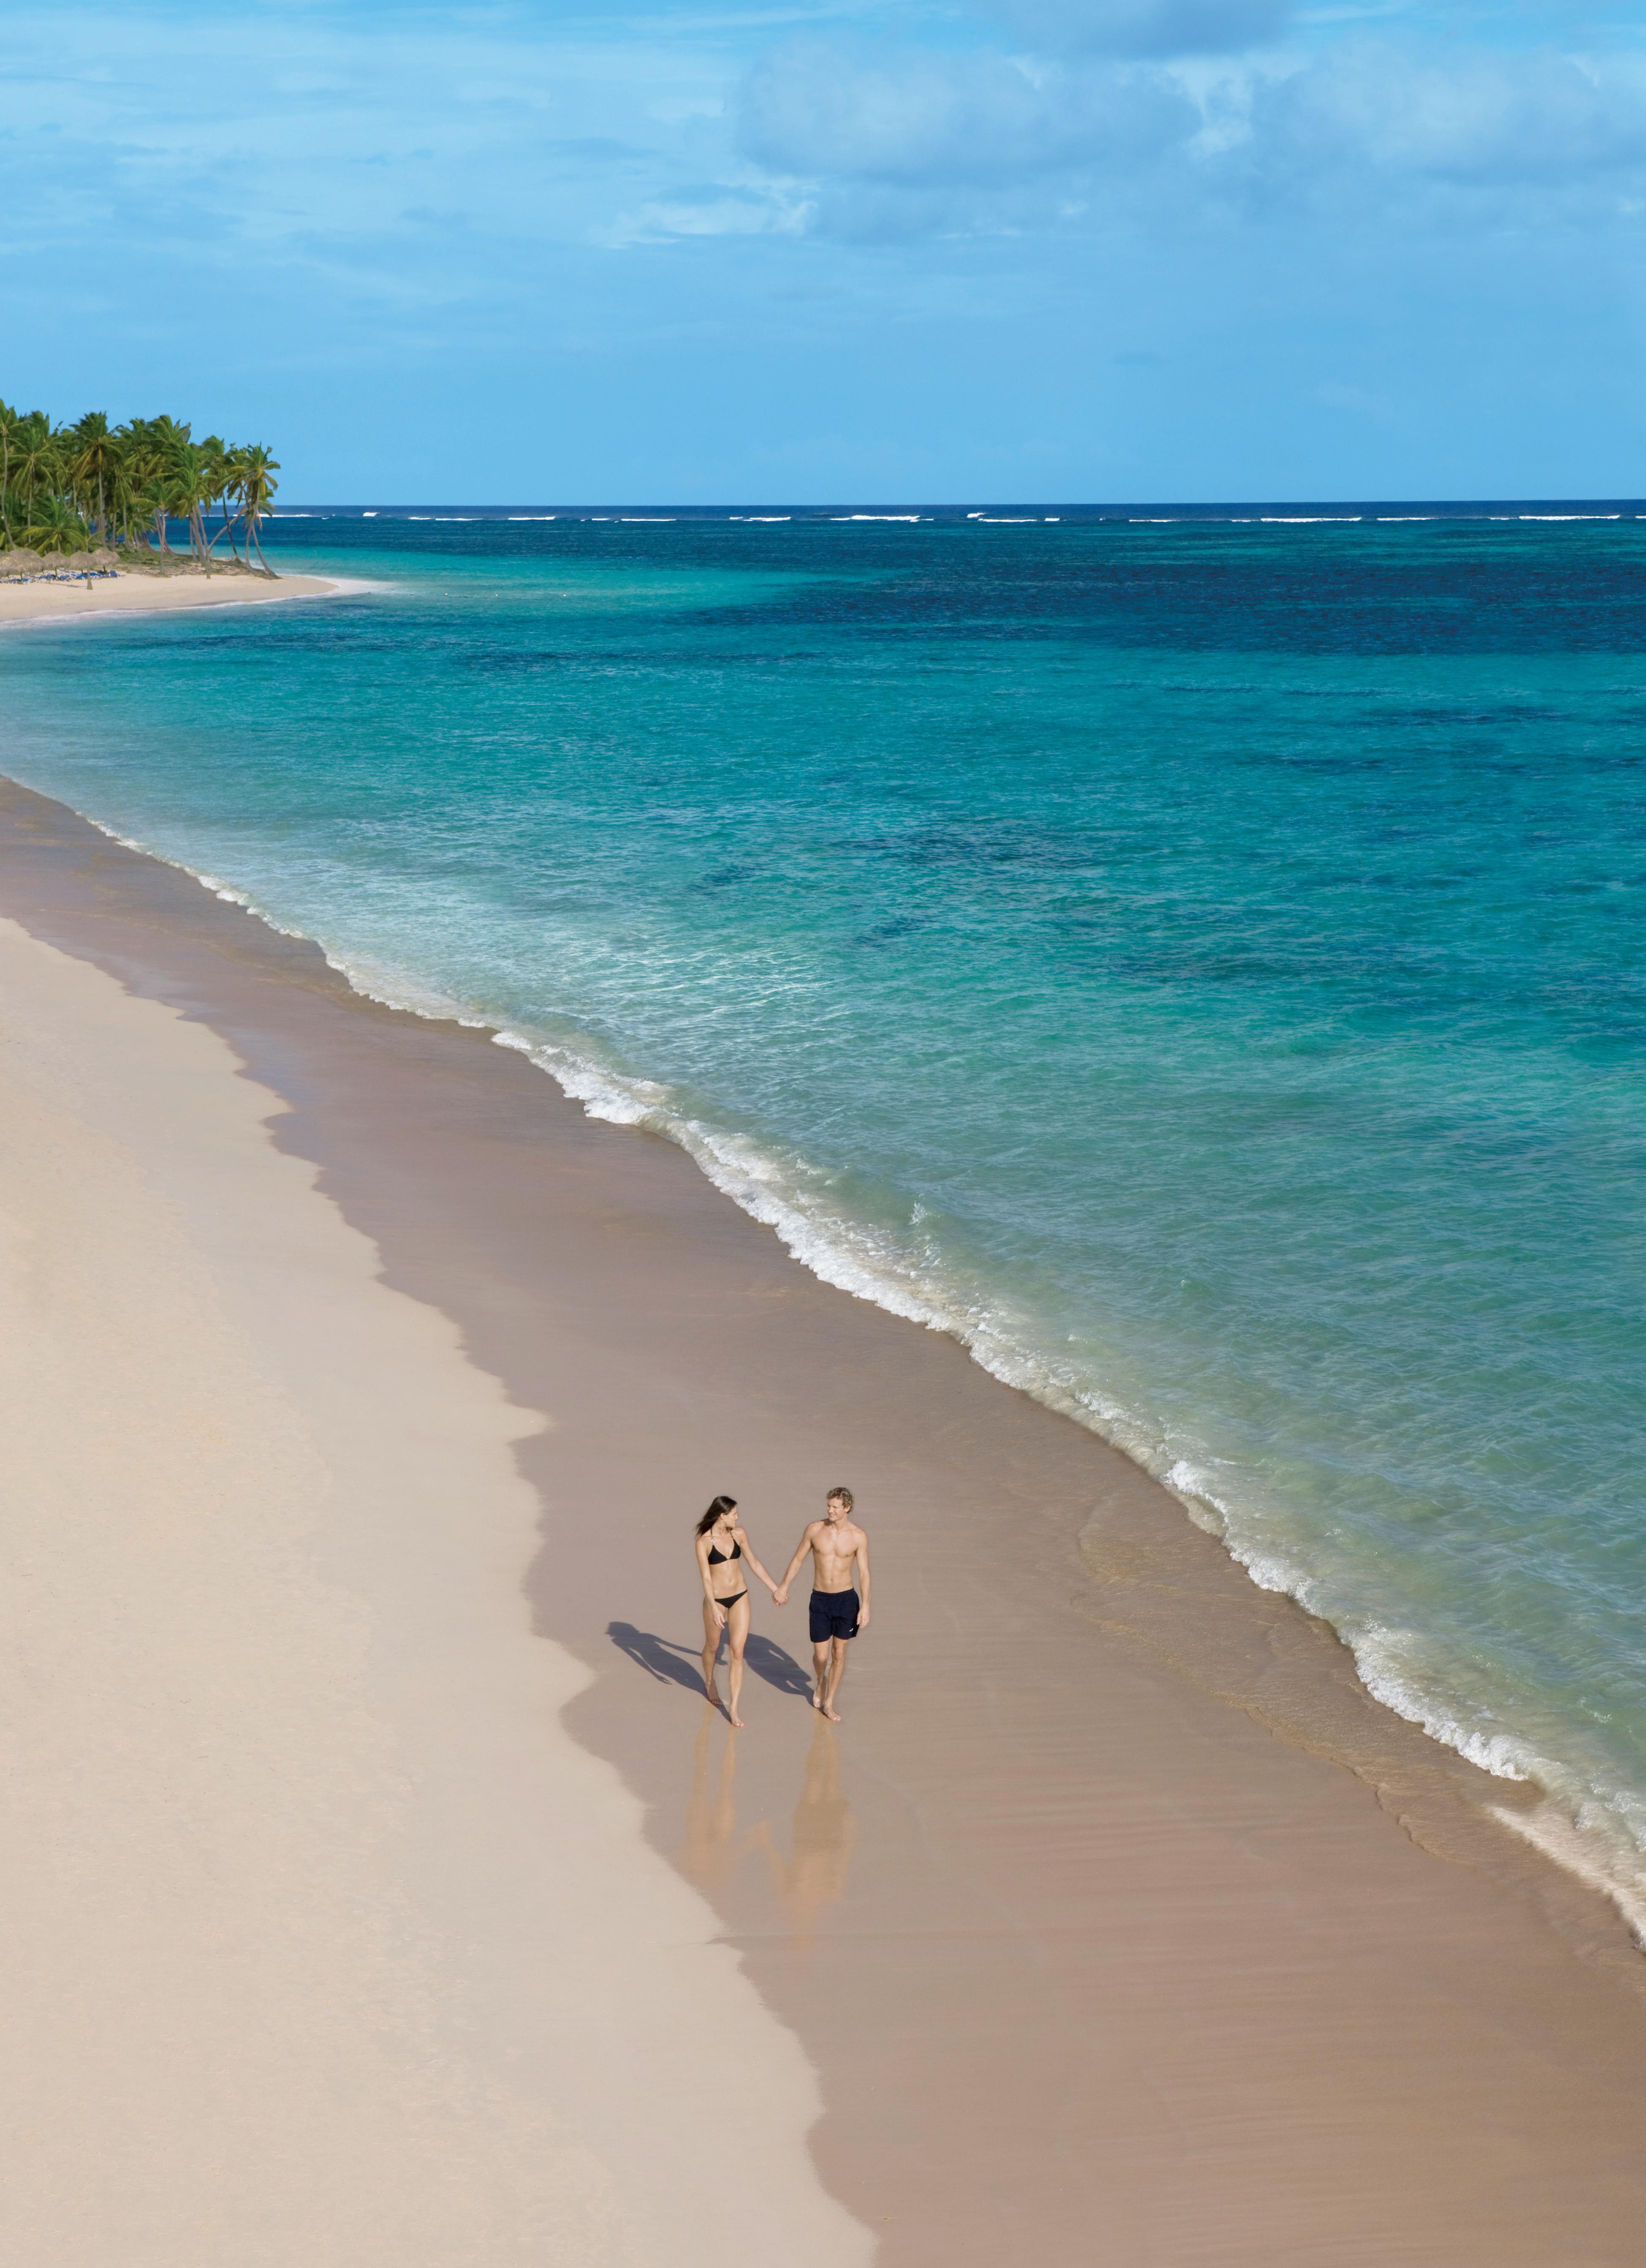 Travel Agency All-Inclusive Resort Dreams Palm Beach 08